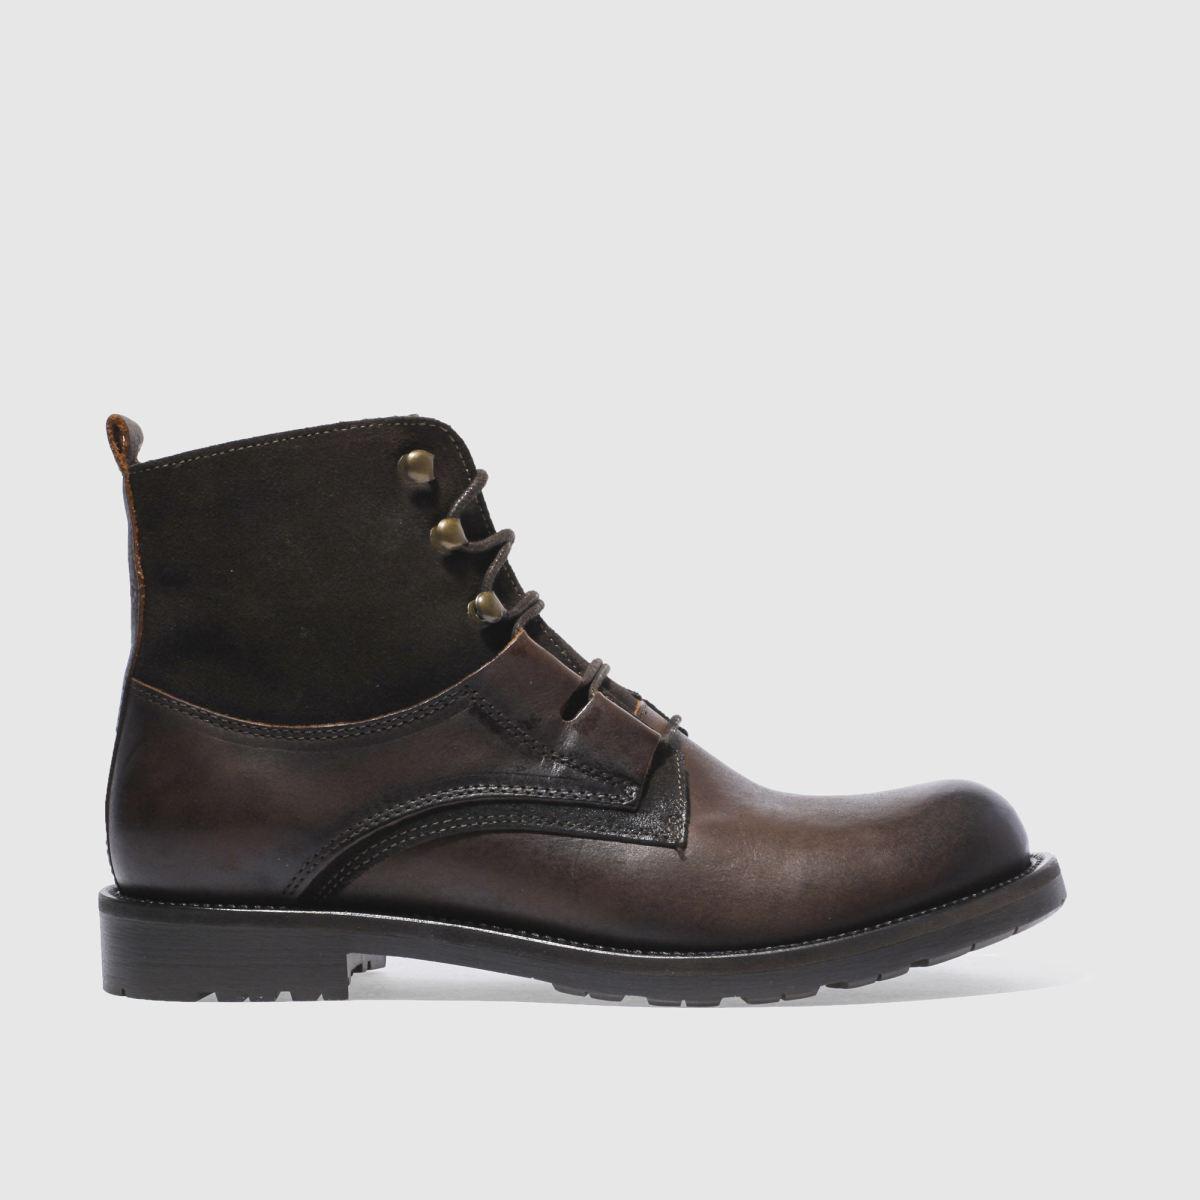 schuh brown duke ghilli boots